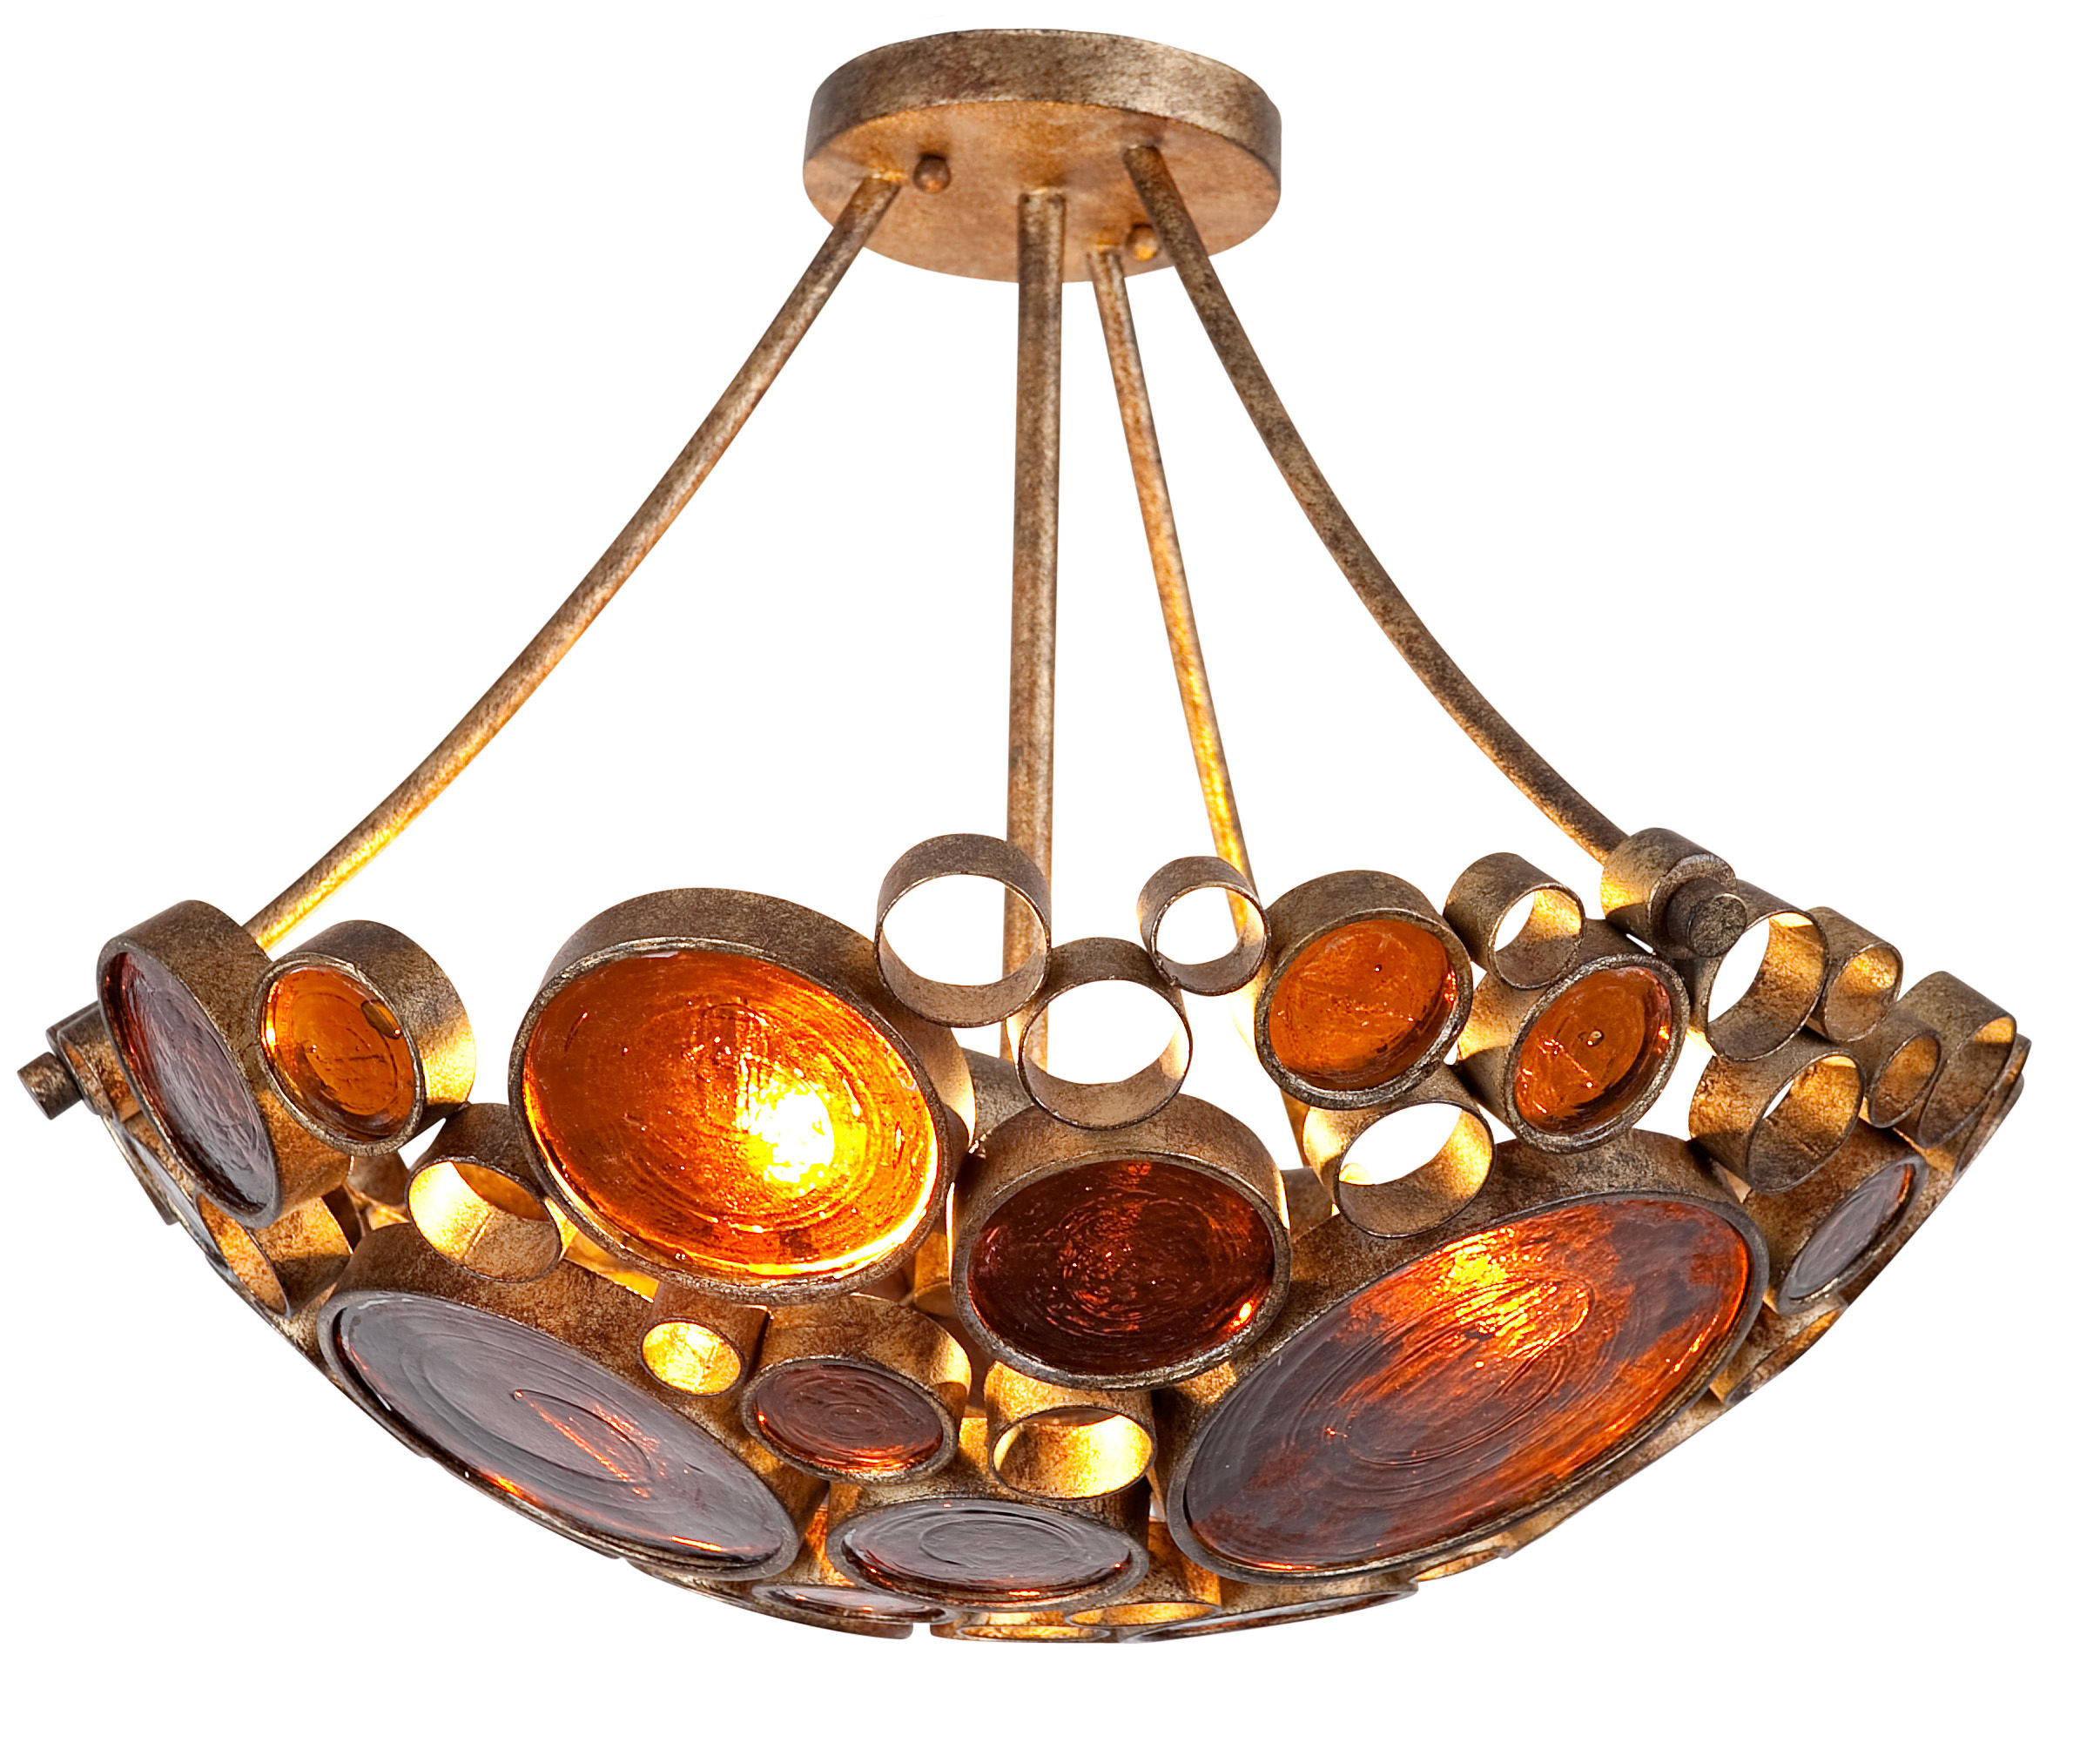 unique designs recycled glass isoonyf chandeliers chandelier fixtures lighting light ceiling